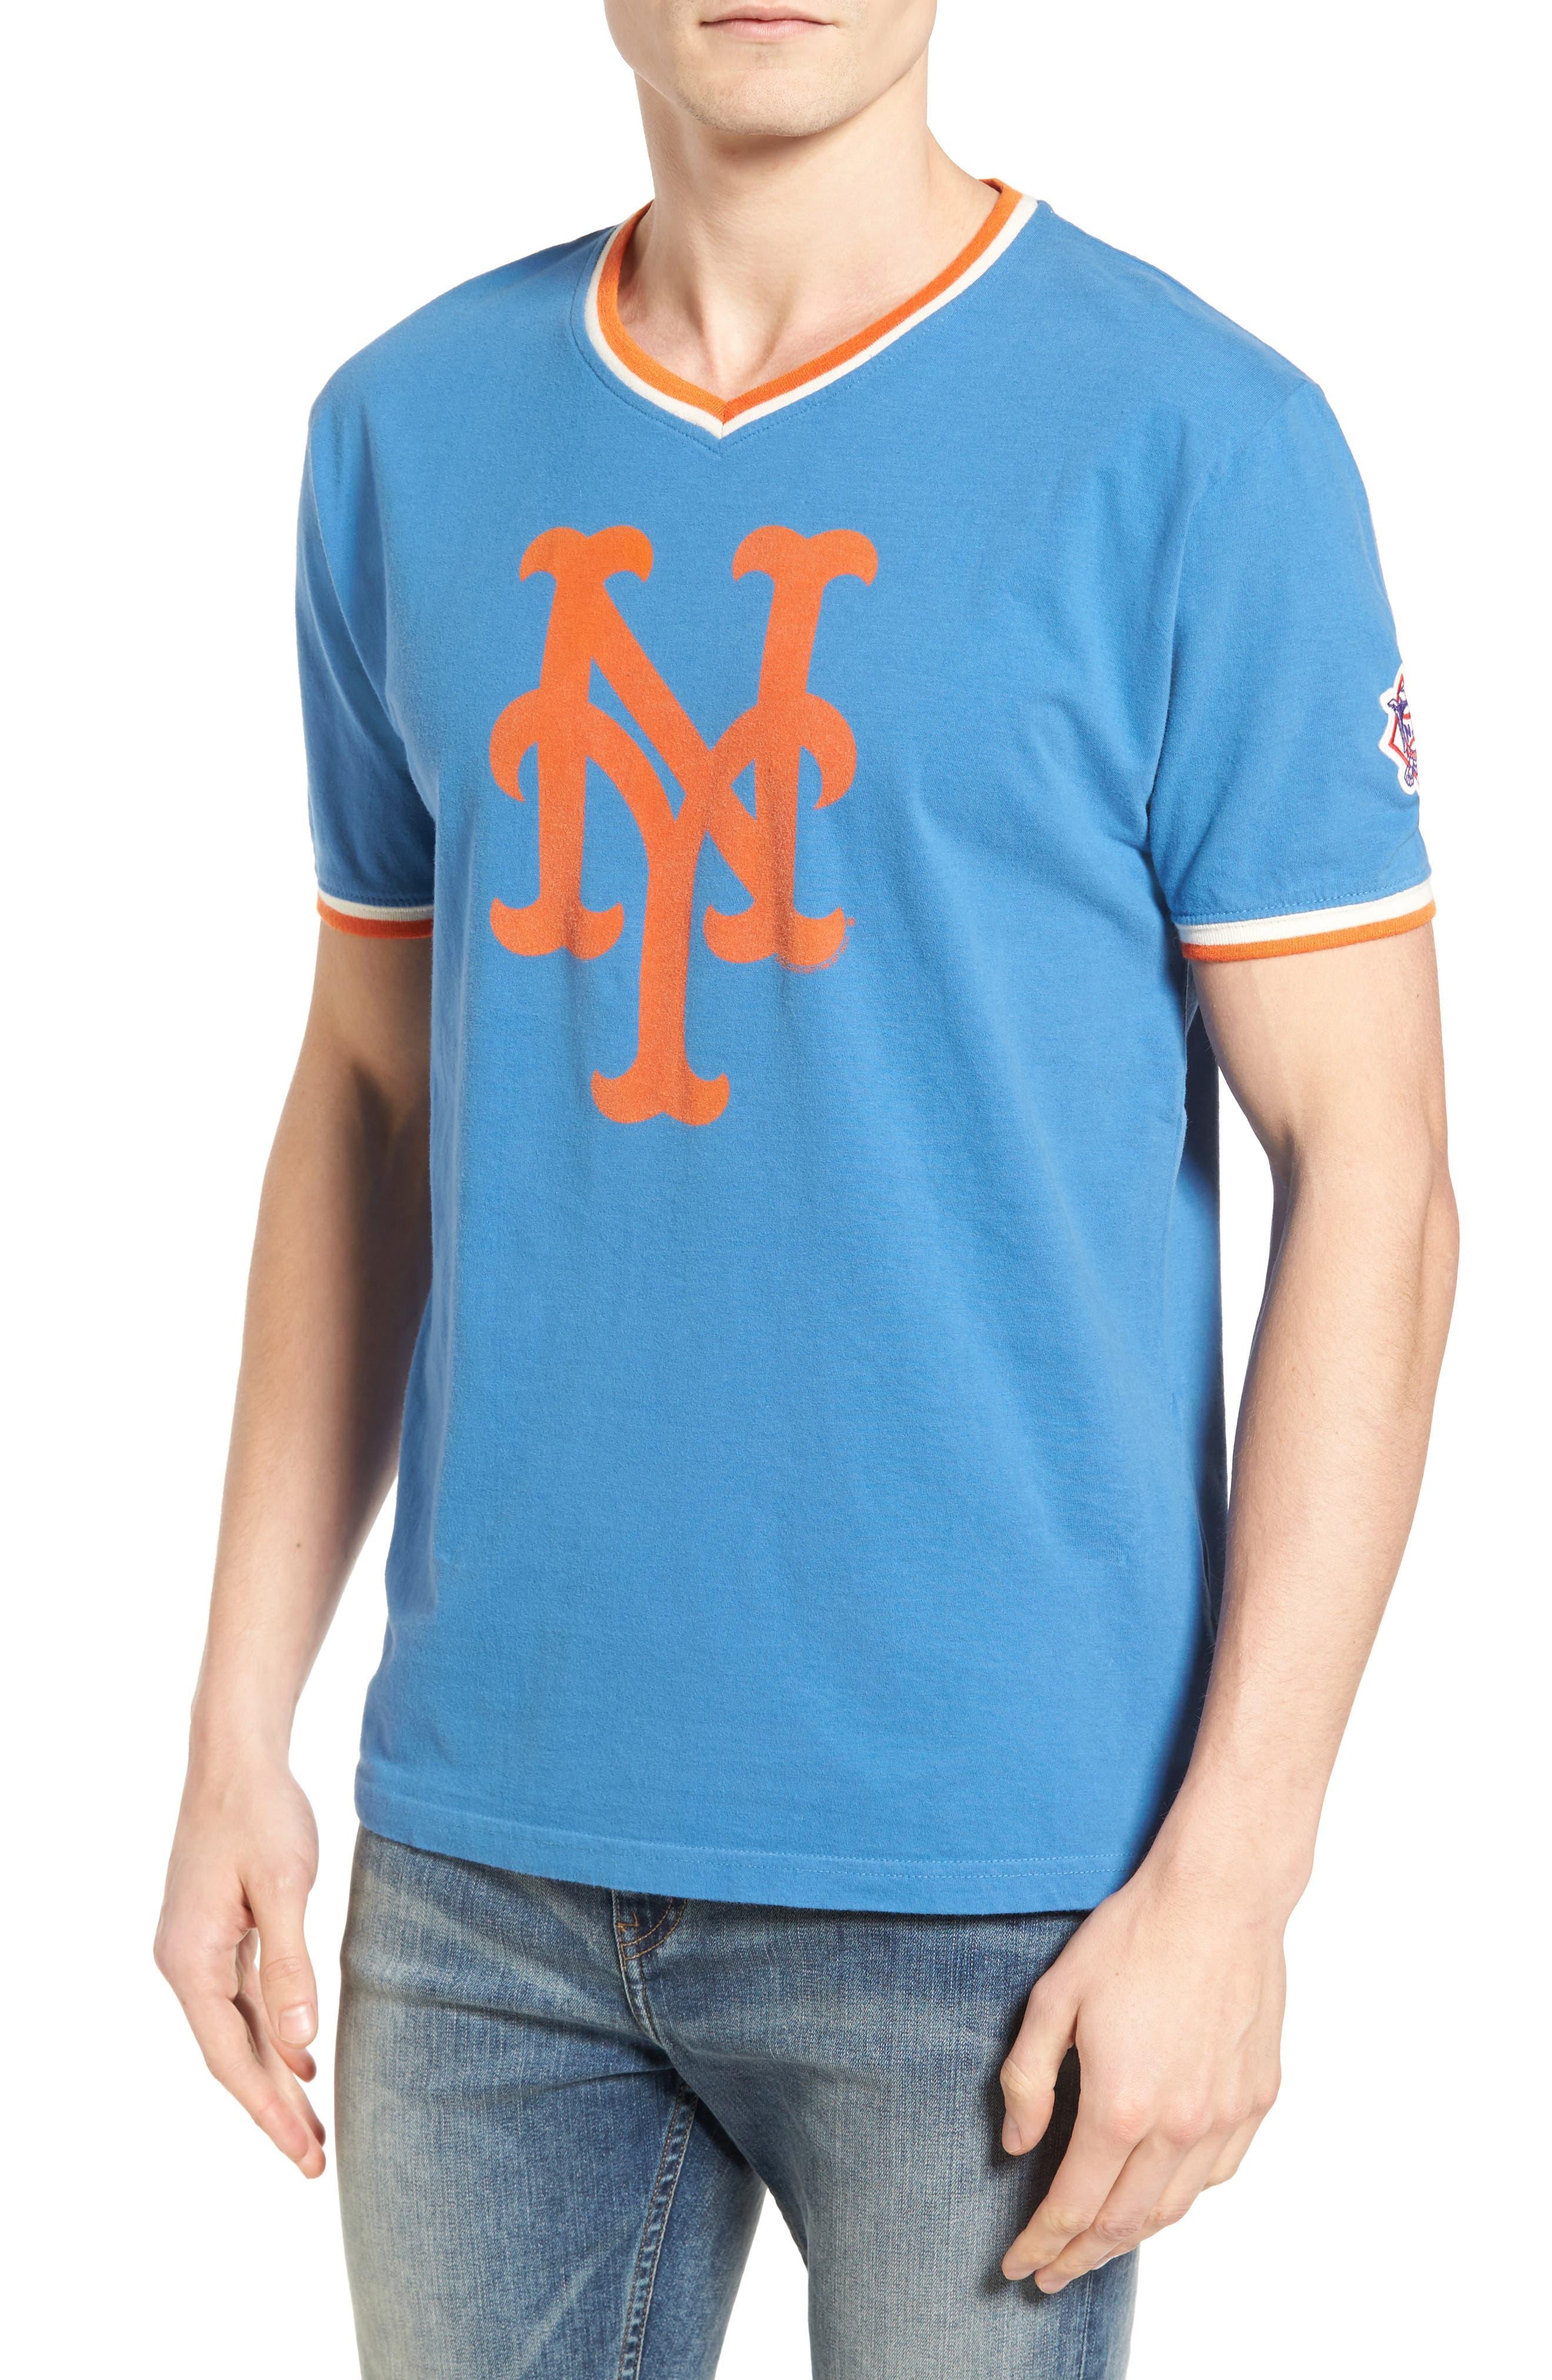 American Needle Eastwood New York Mets T-Shirt